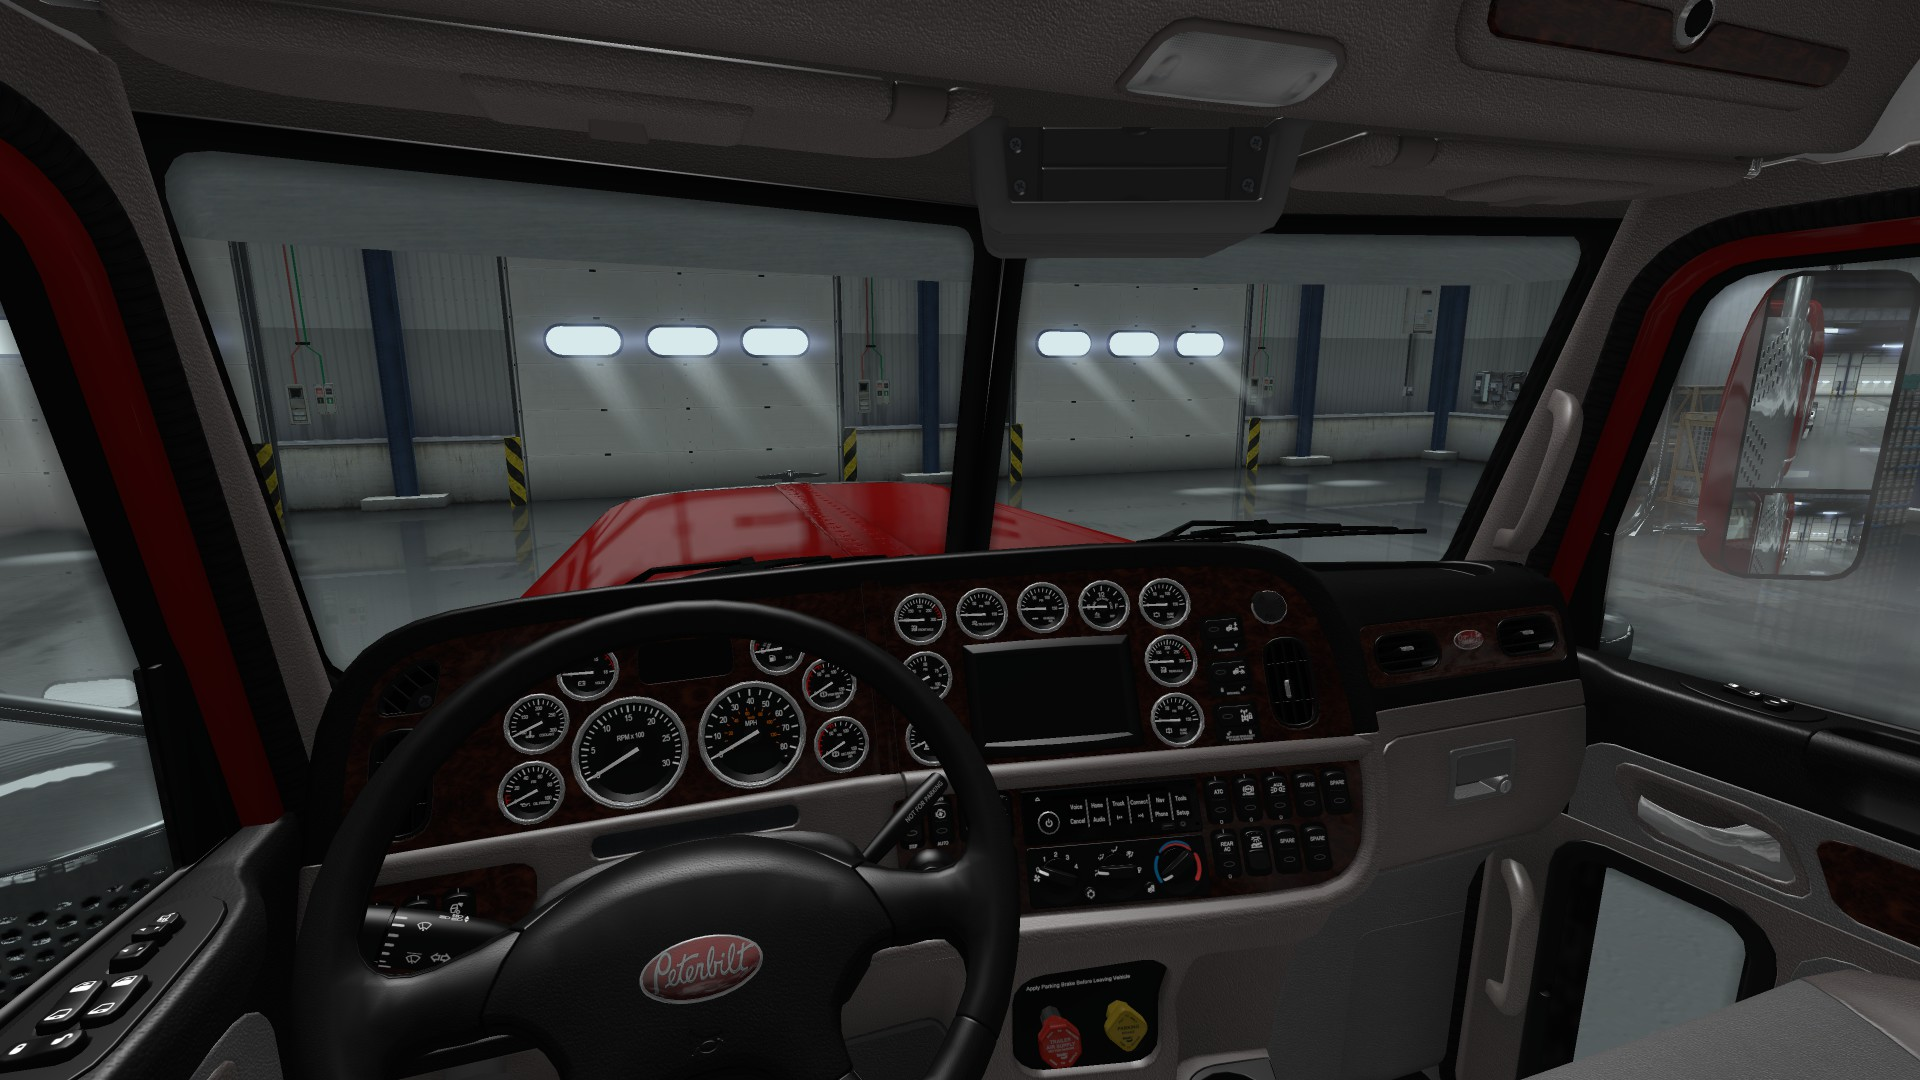 Peterbilt 389 Interior Exterior Rework V 1 0 Ats Mods American Truck Simulator Mods Atsmod Net